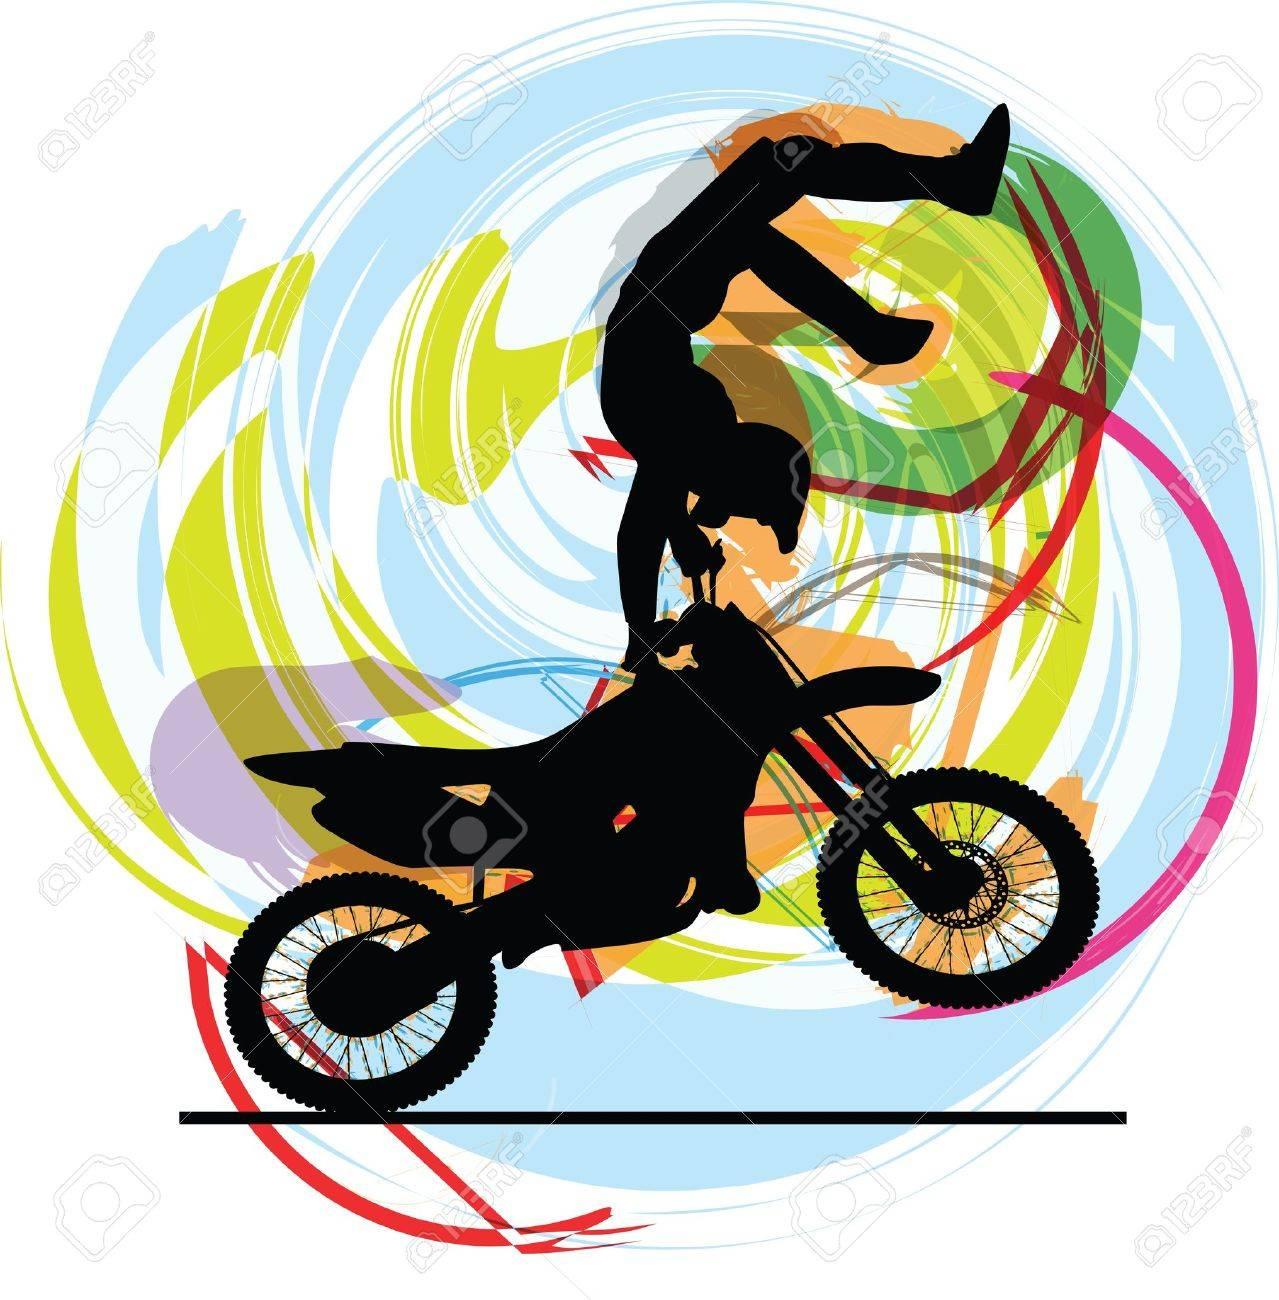 Abstract sketch of biker Illustration - 14840685